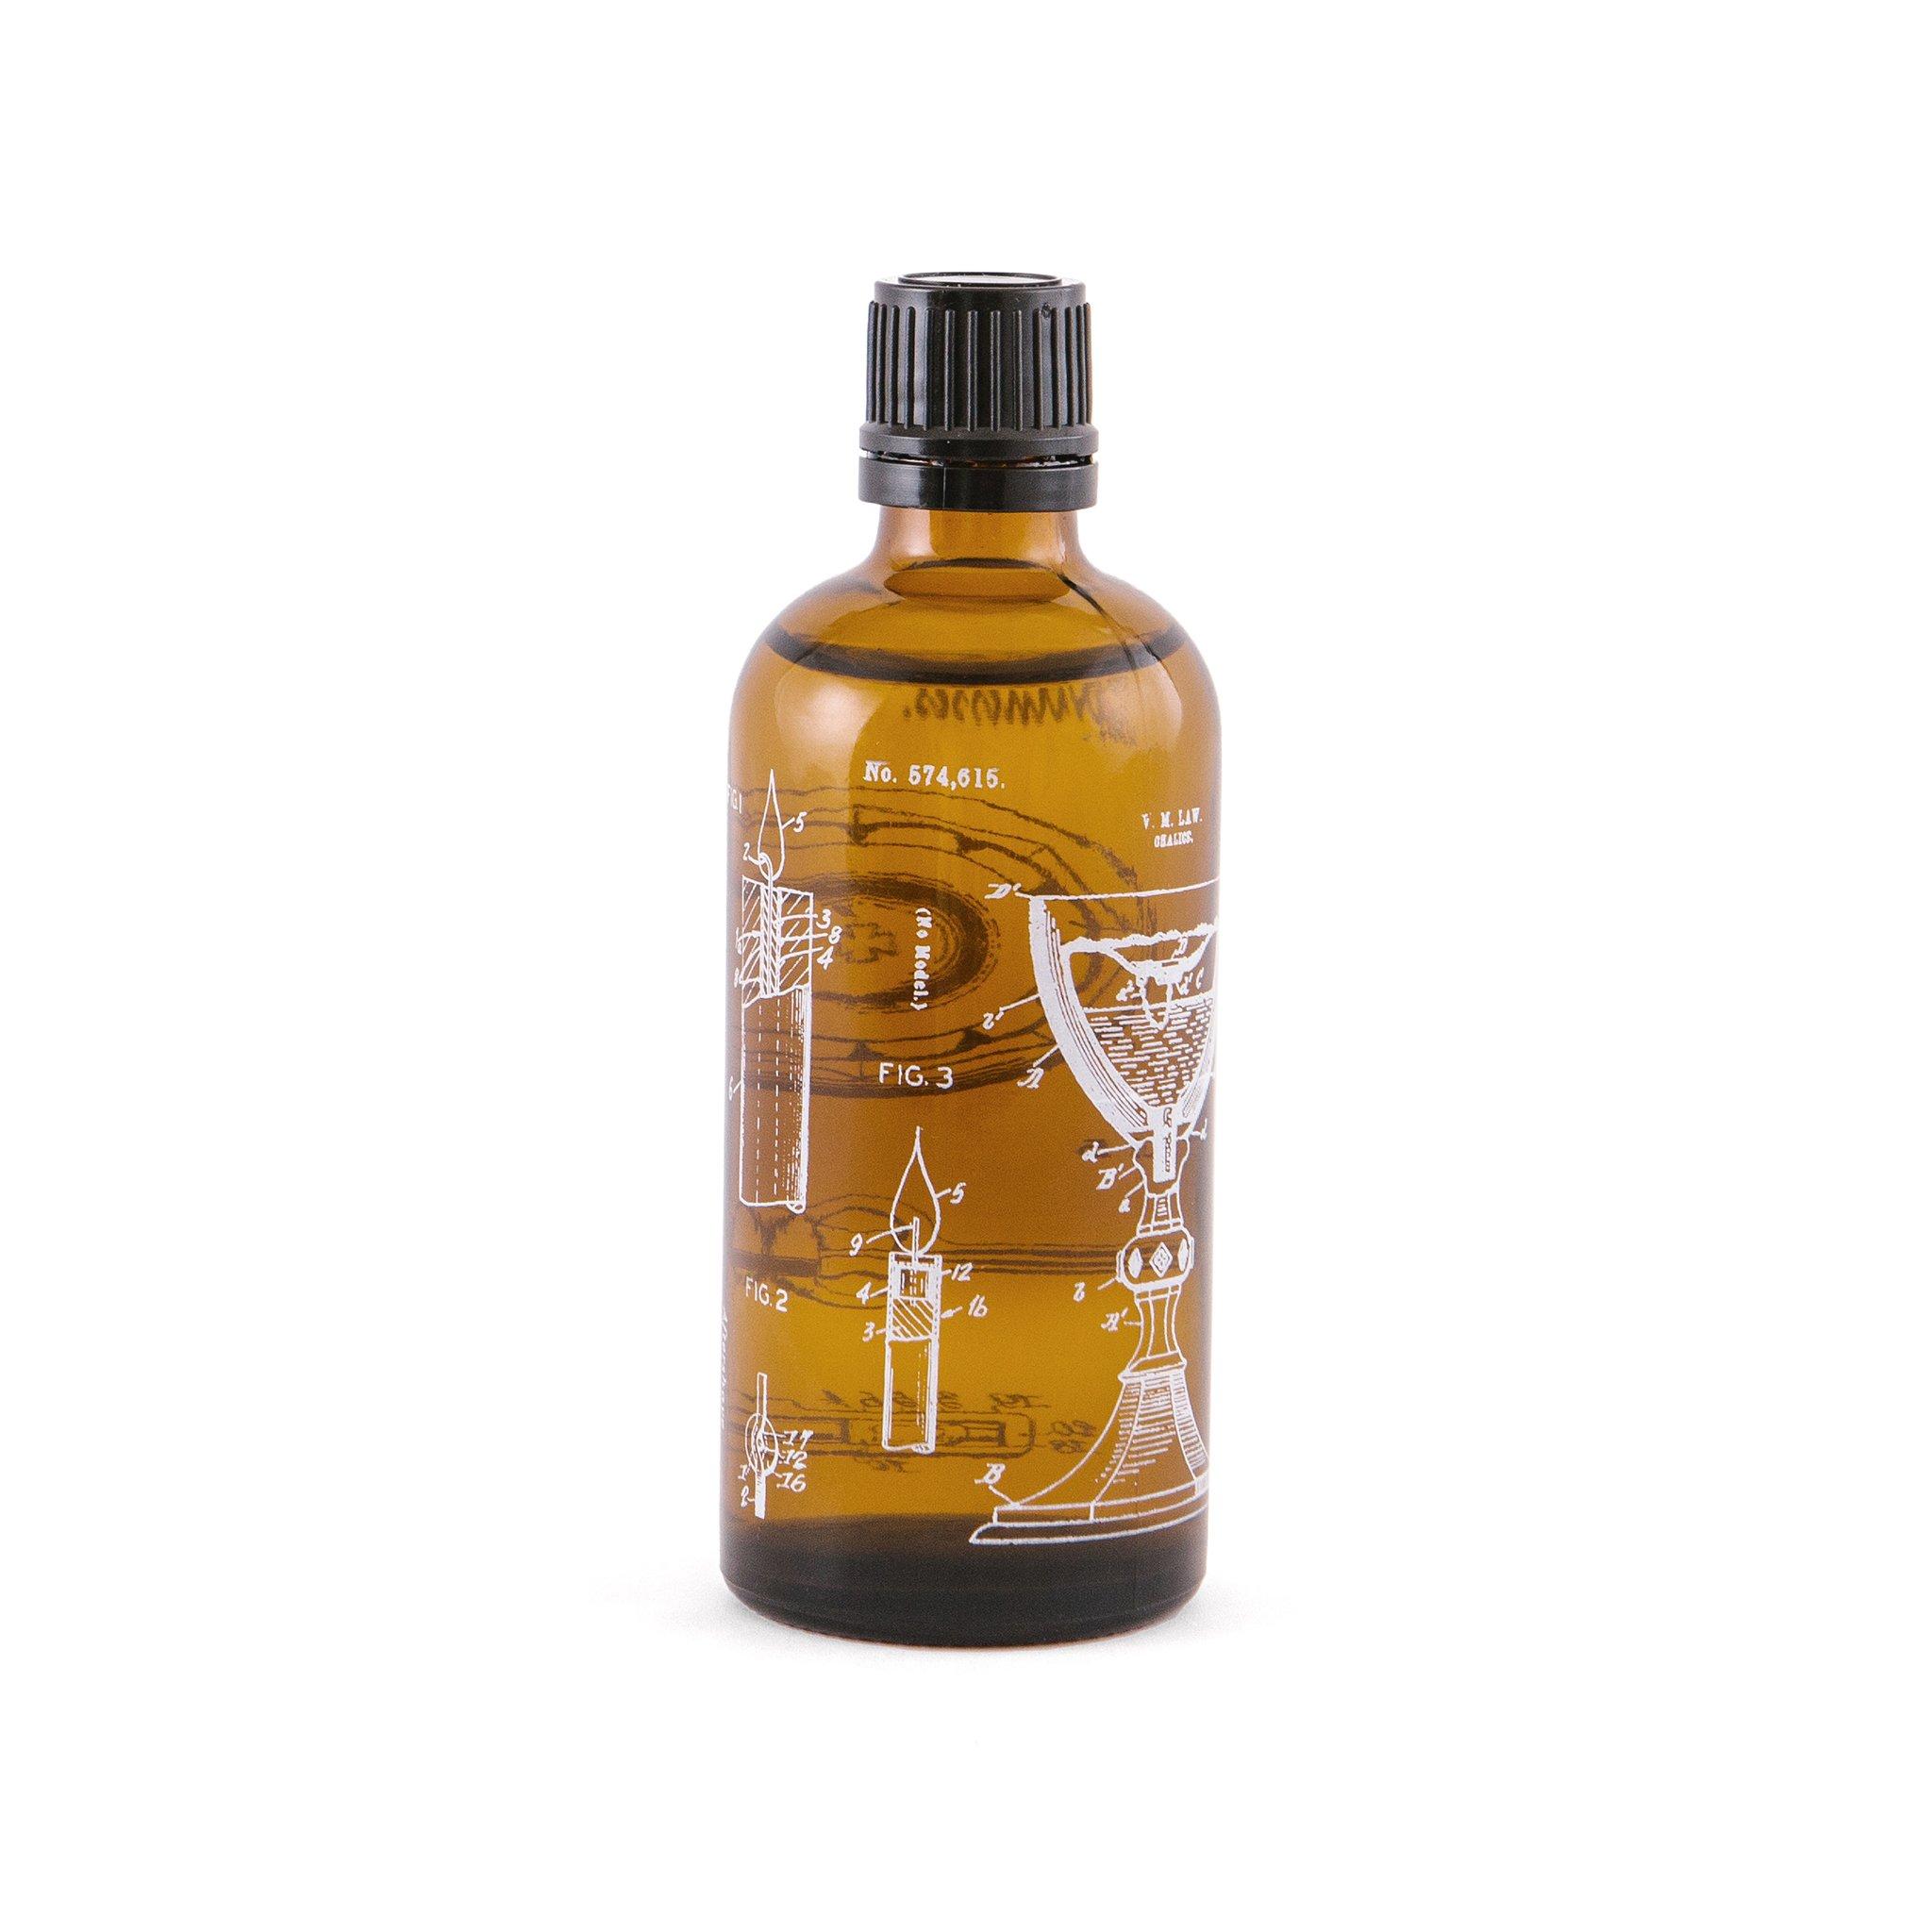 Barrister and Mann - Reserve Lavender - Aftershave image